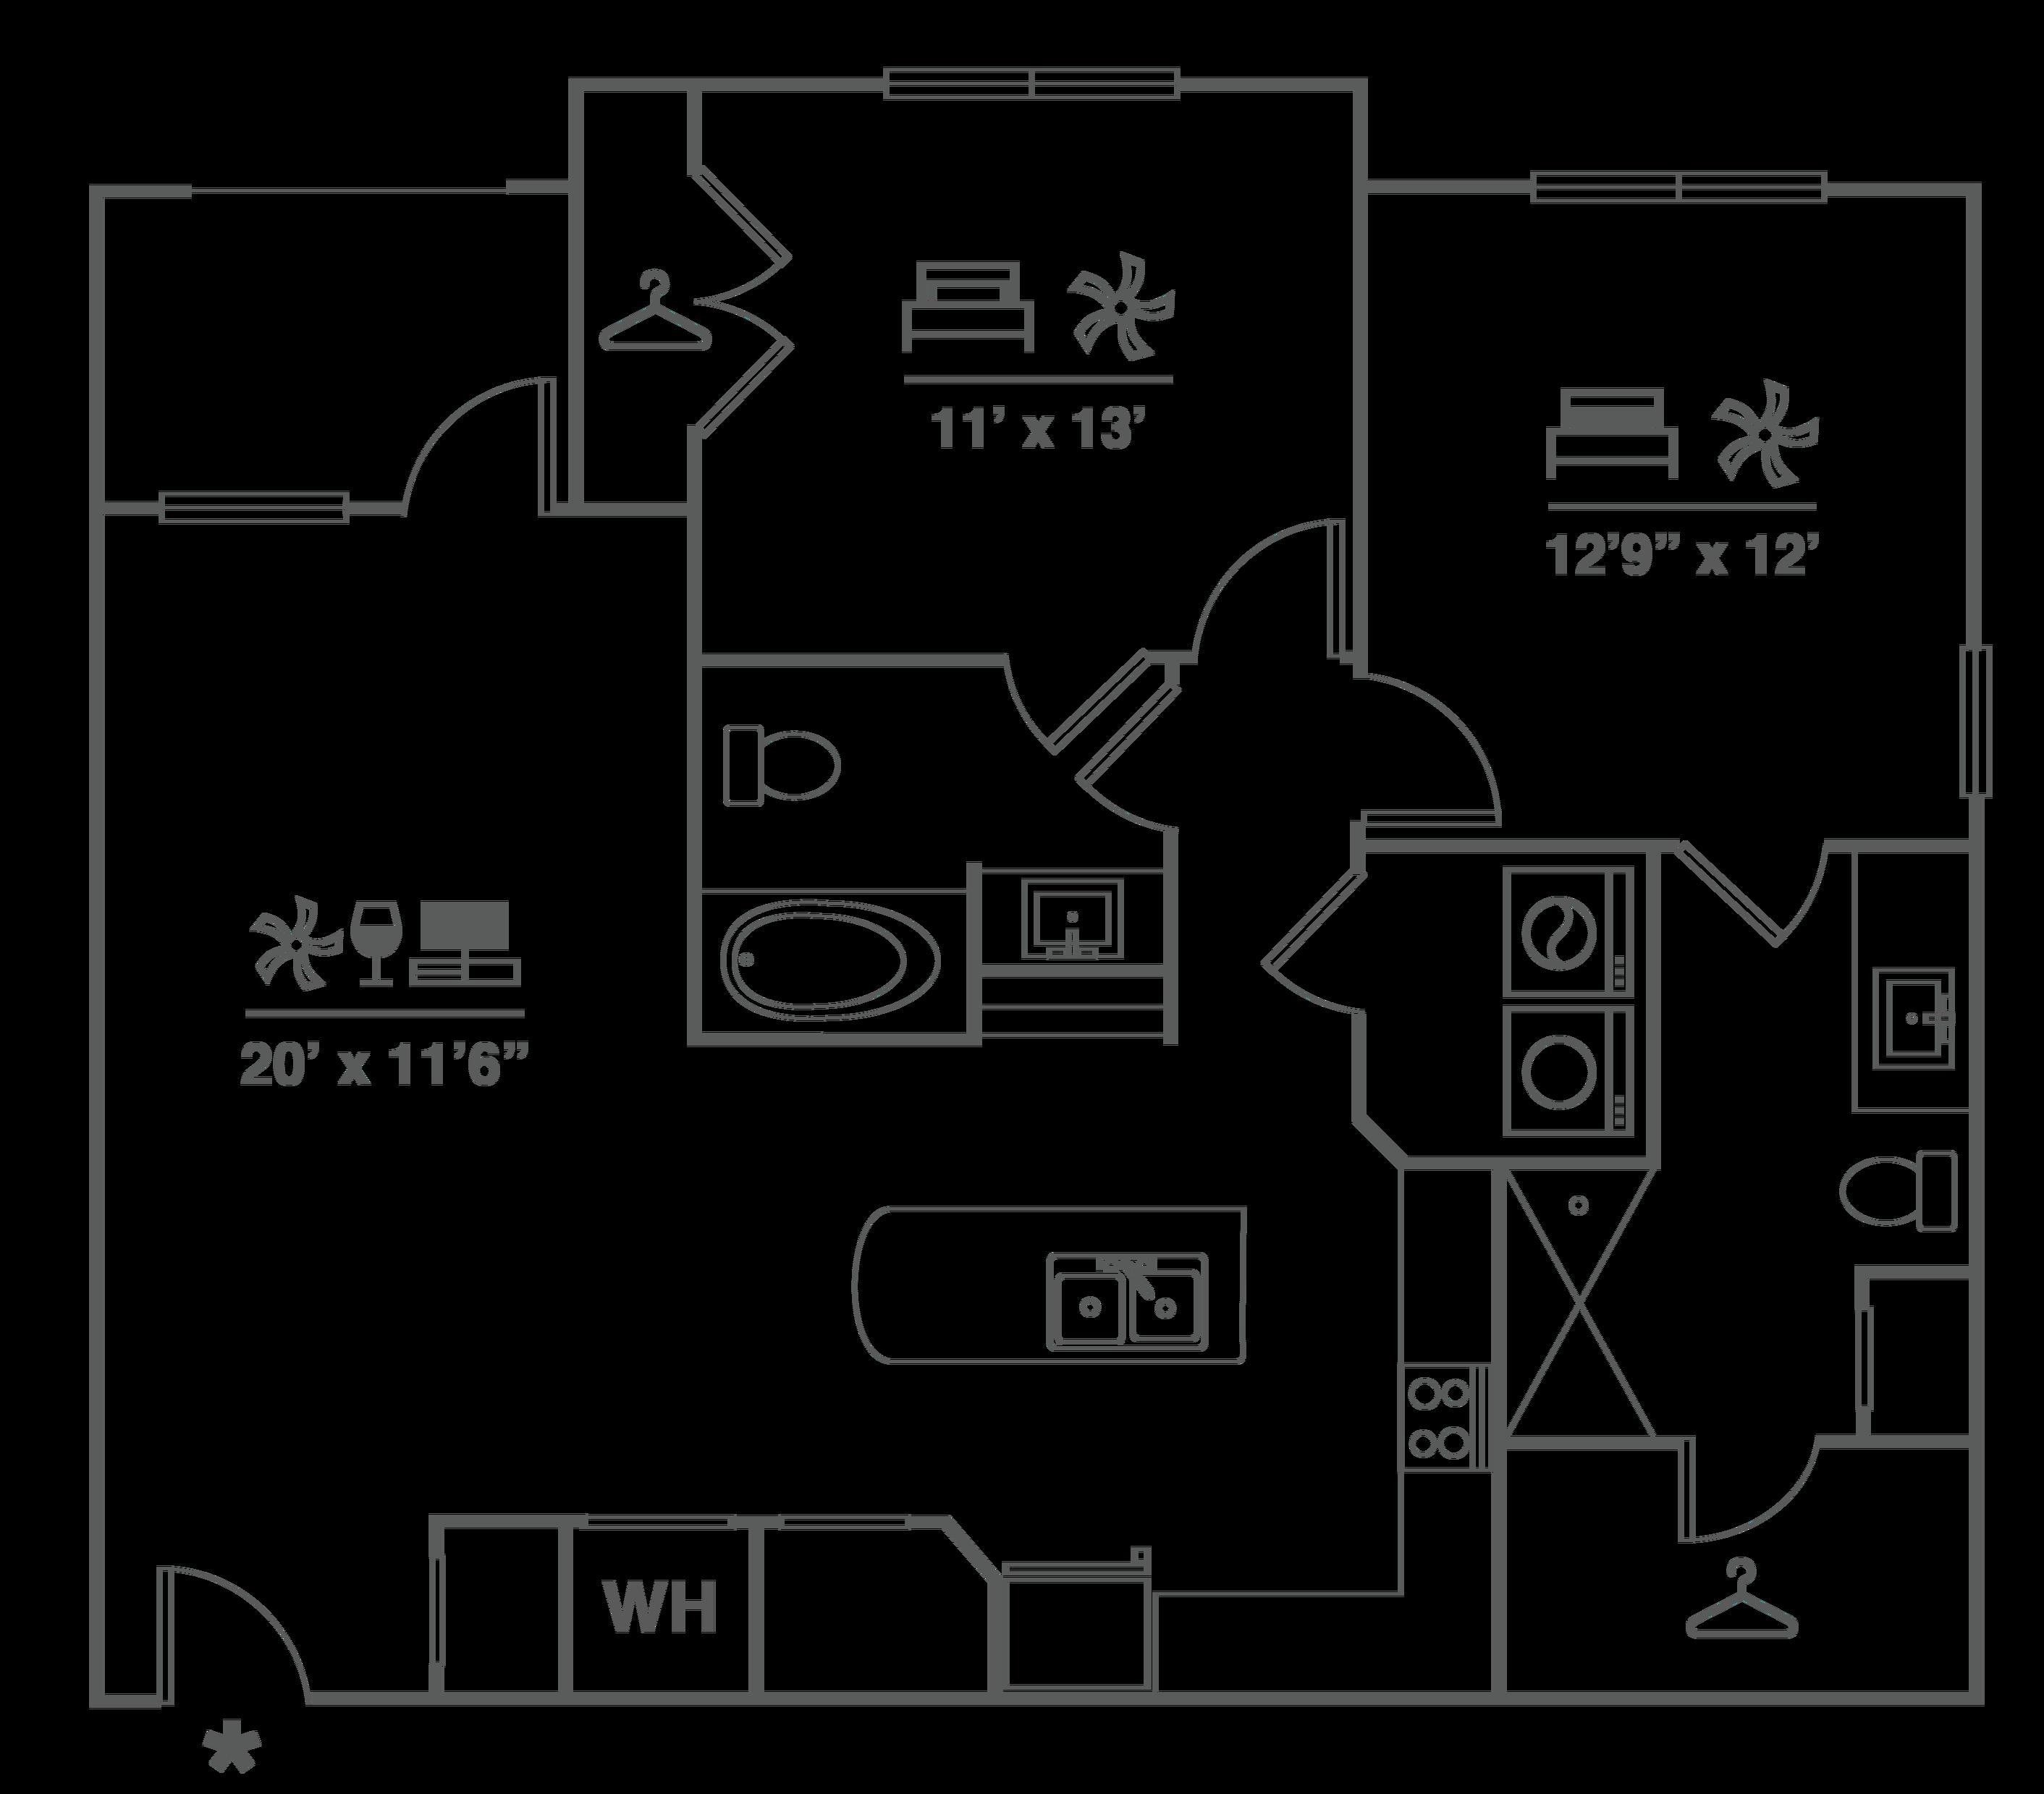 B7 Floor Plan Image